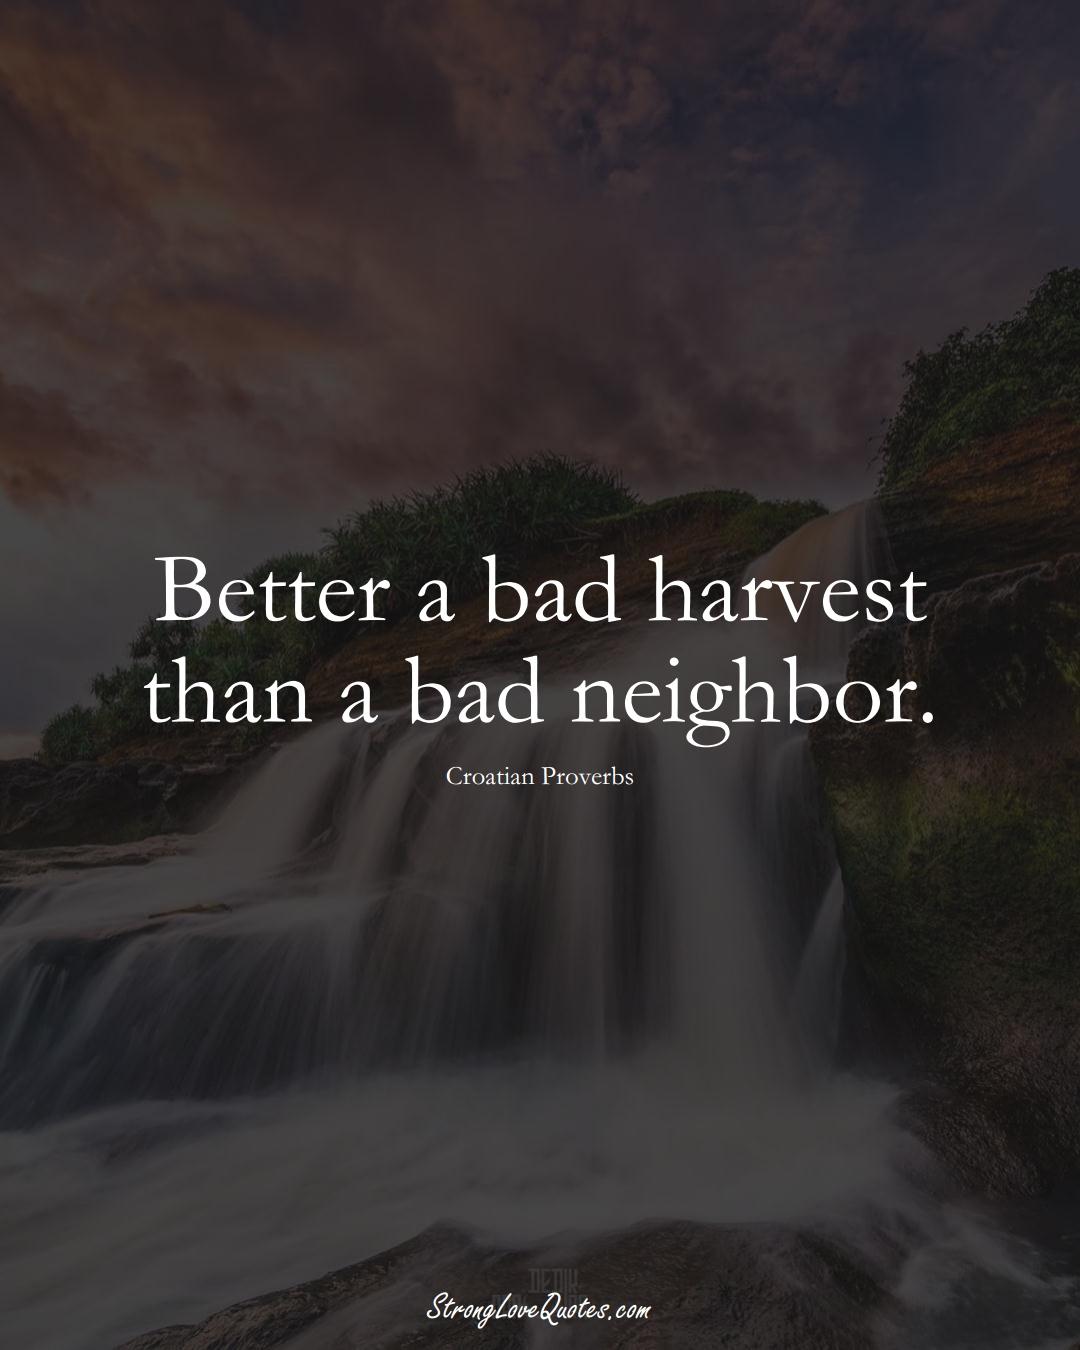 Better a bad harvest than a bad neighbor. (Croatian Sayings);  #EuropeanSayings